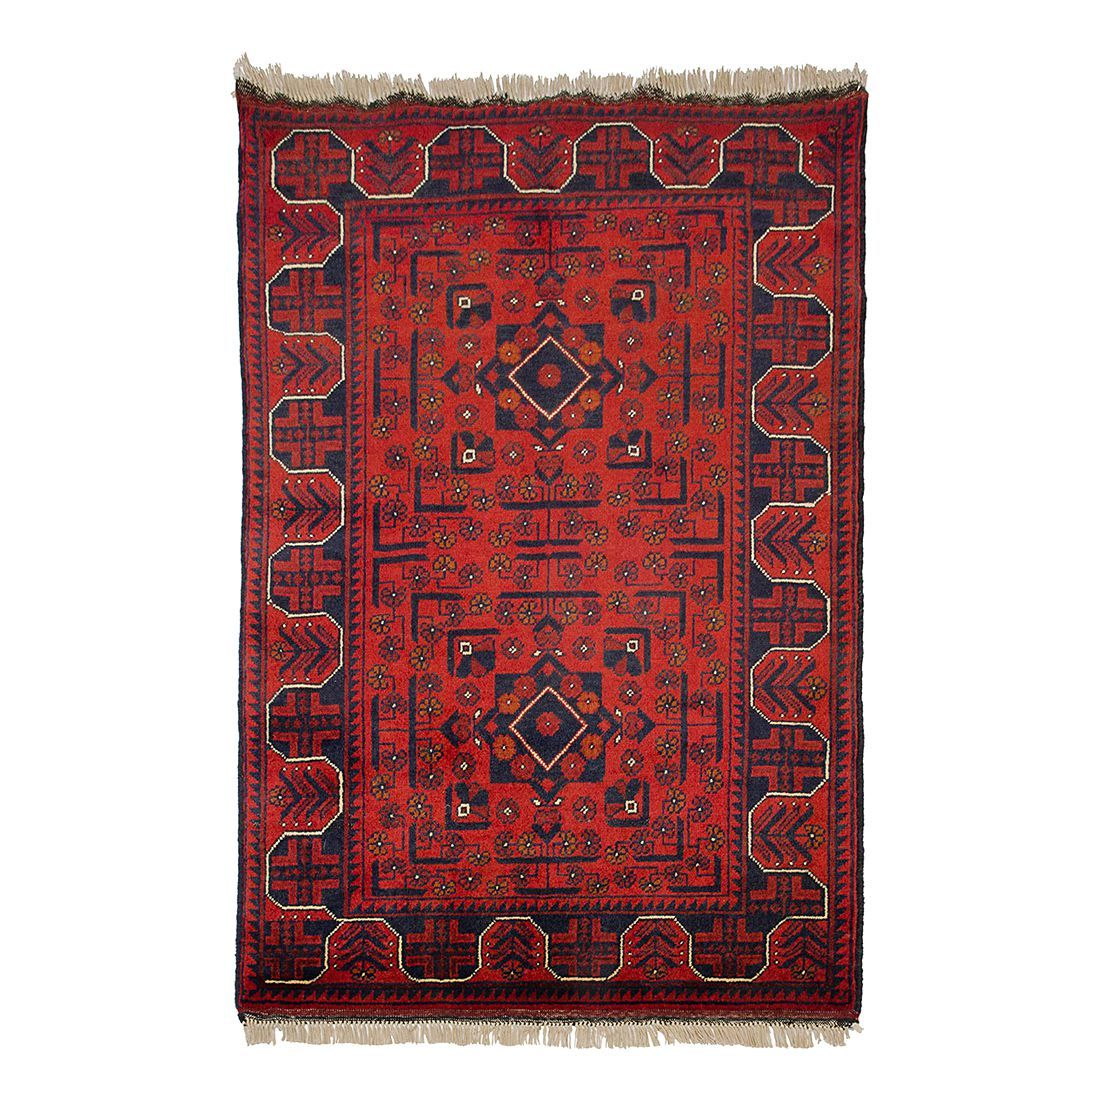 Teppich Afghan Khal Mohammadi   Rot   130 X 200 Cm, Parwis Jetzt Bestellen  Unter